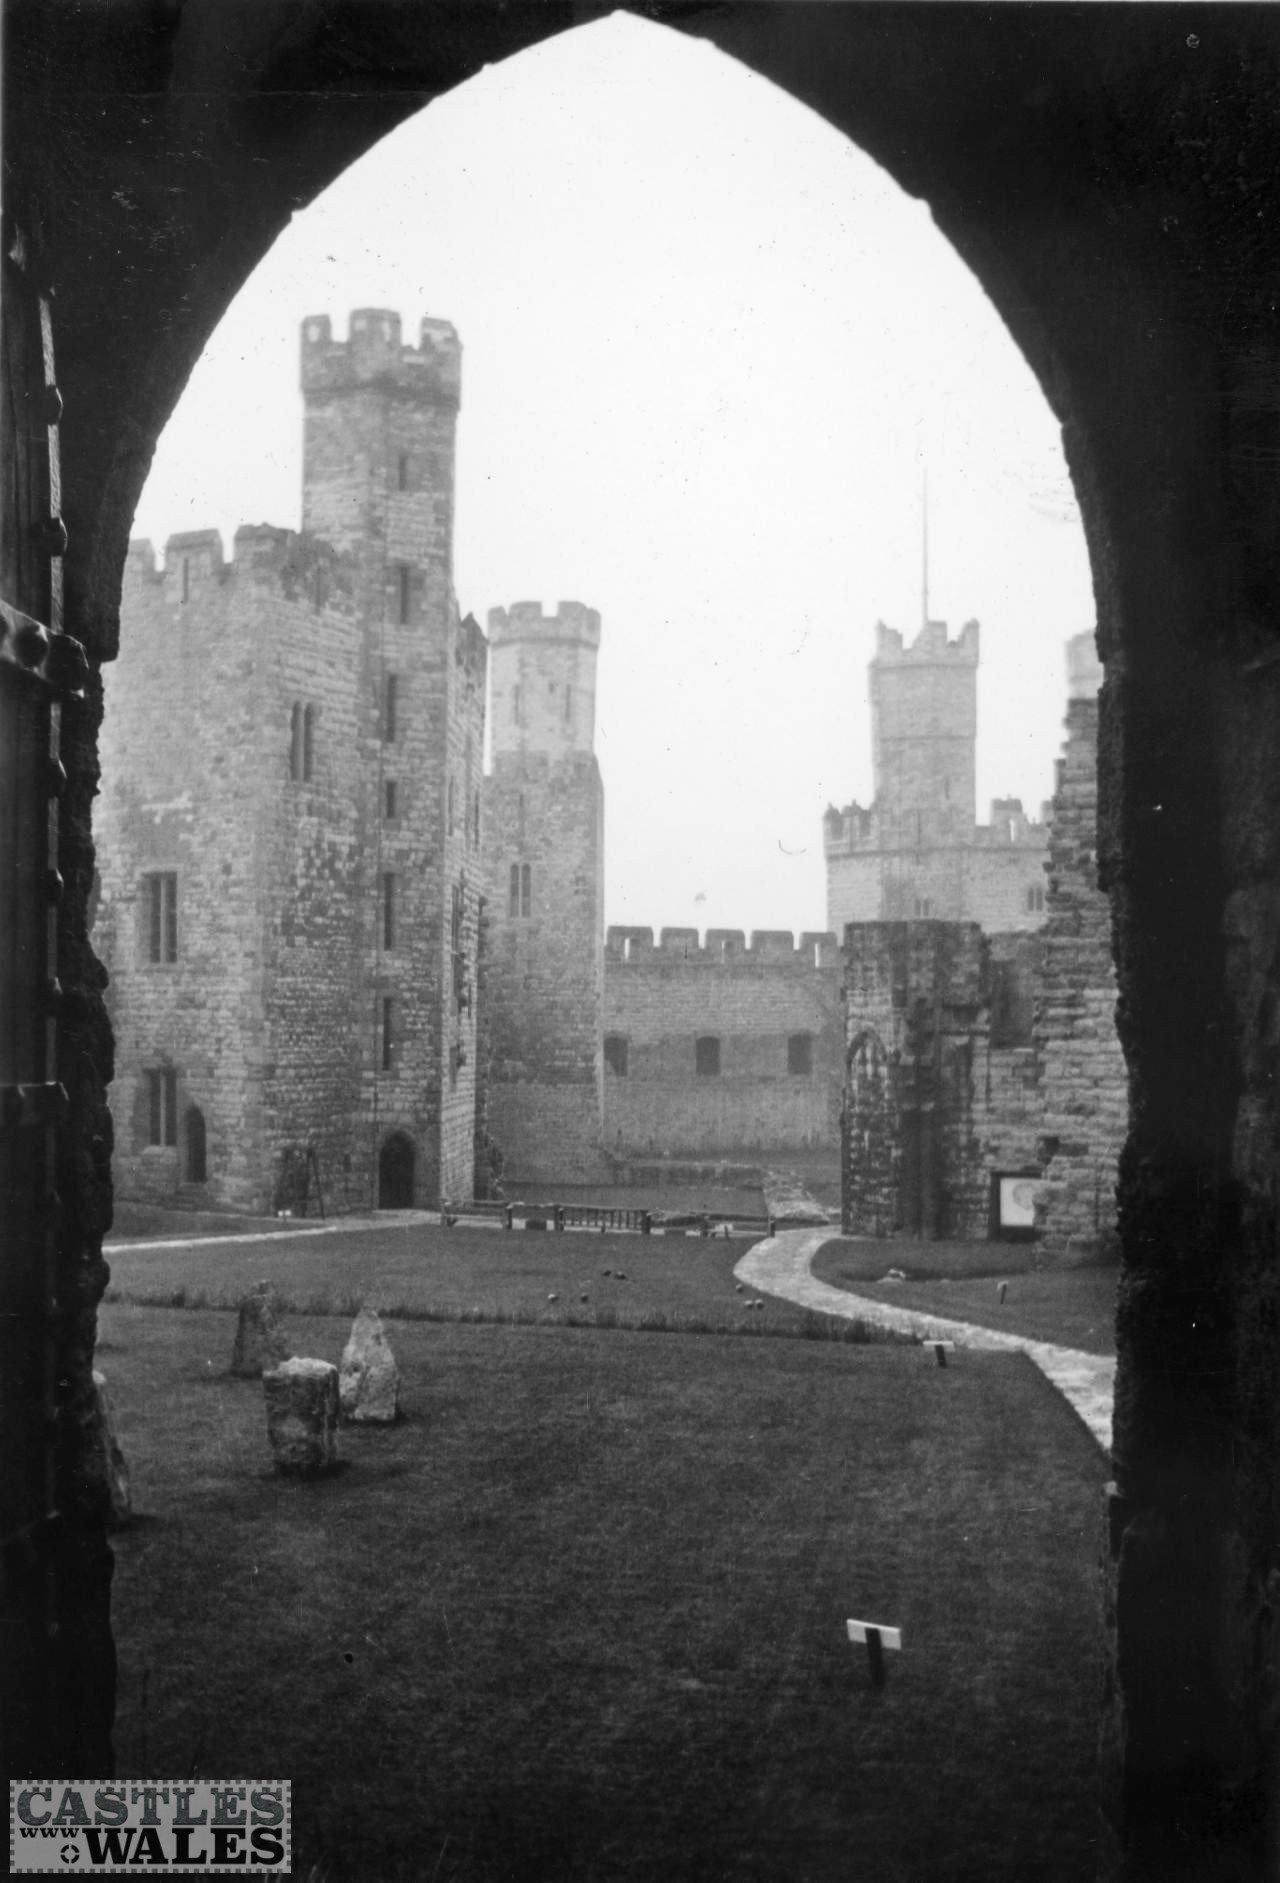 Caernarfon Castle Courtyard in 1935